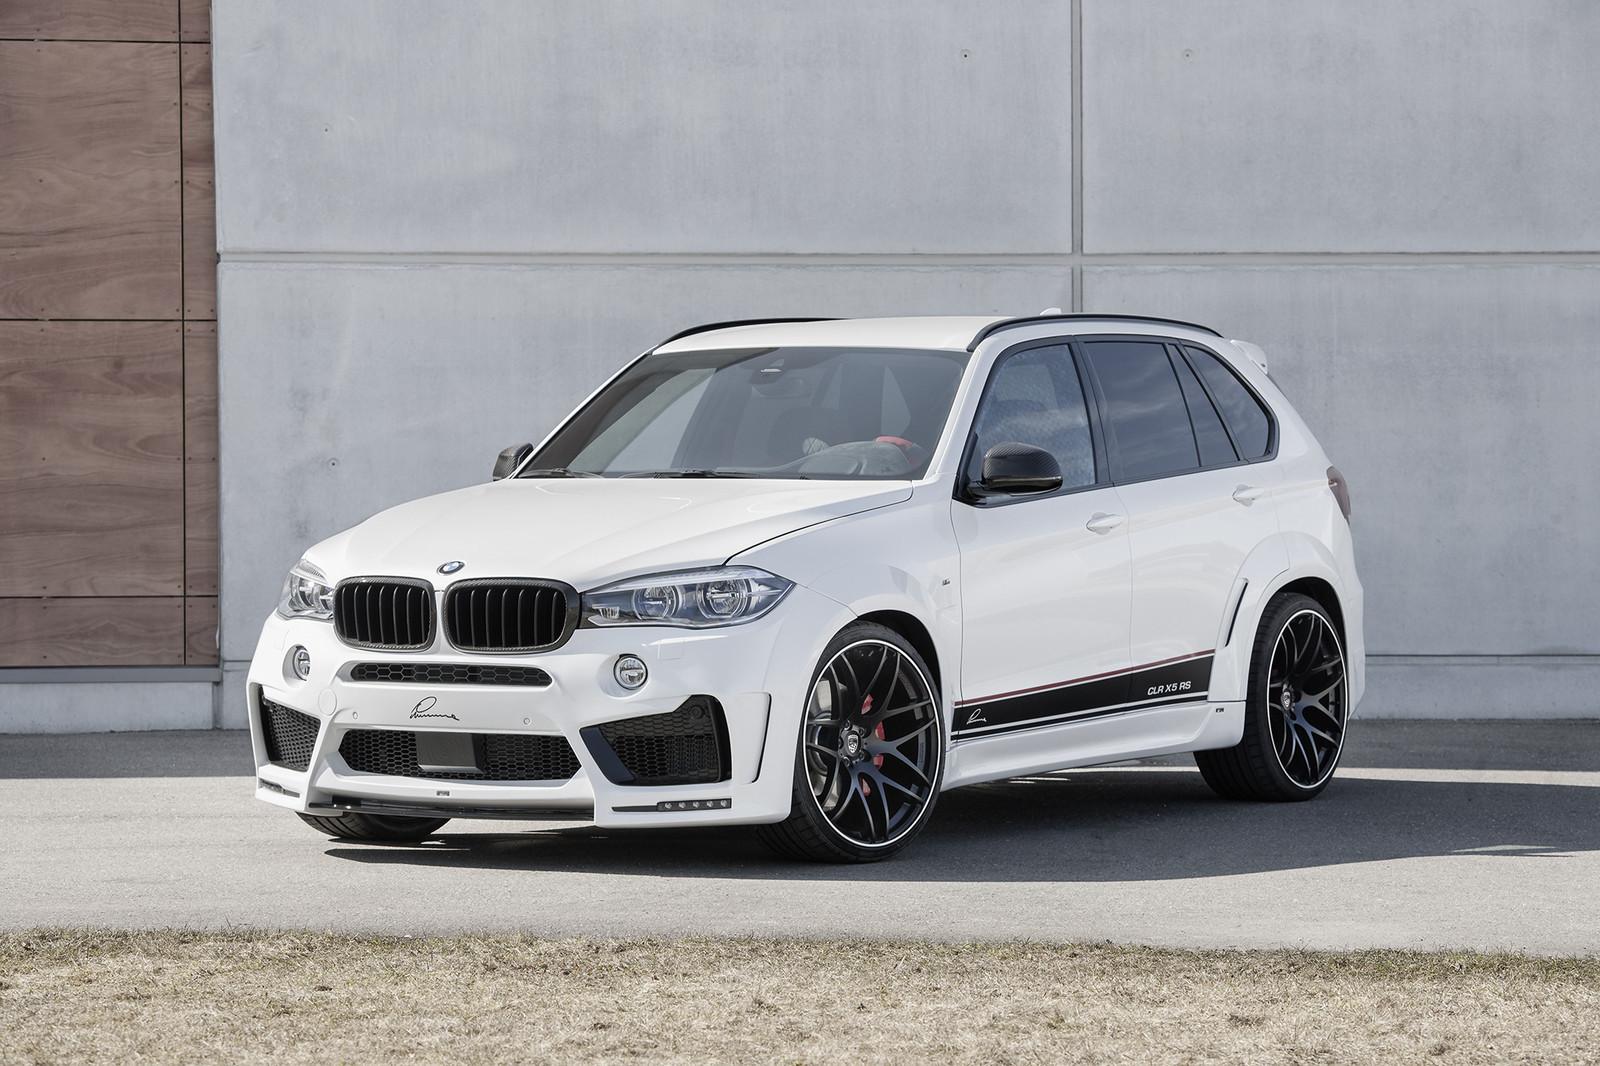 LUMMA CLR X 5 RS BODY KIT FOR BMW X5 M50D F15